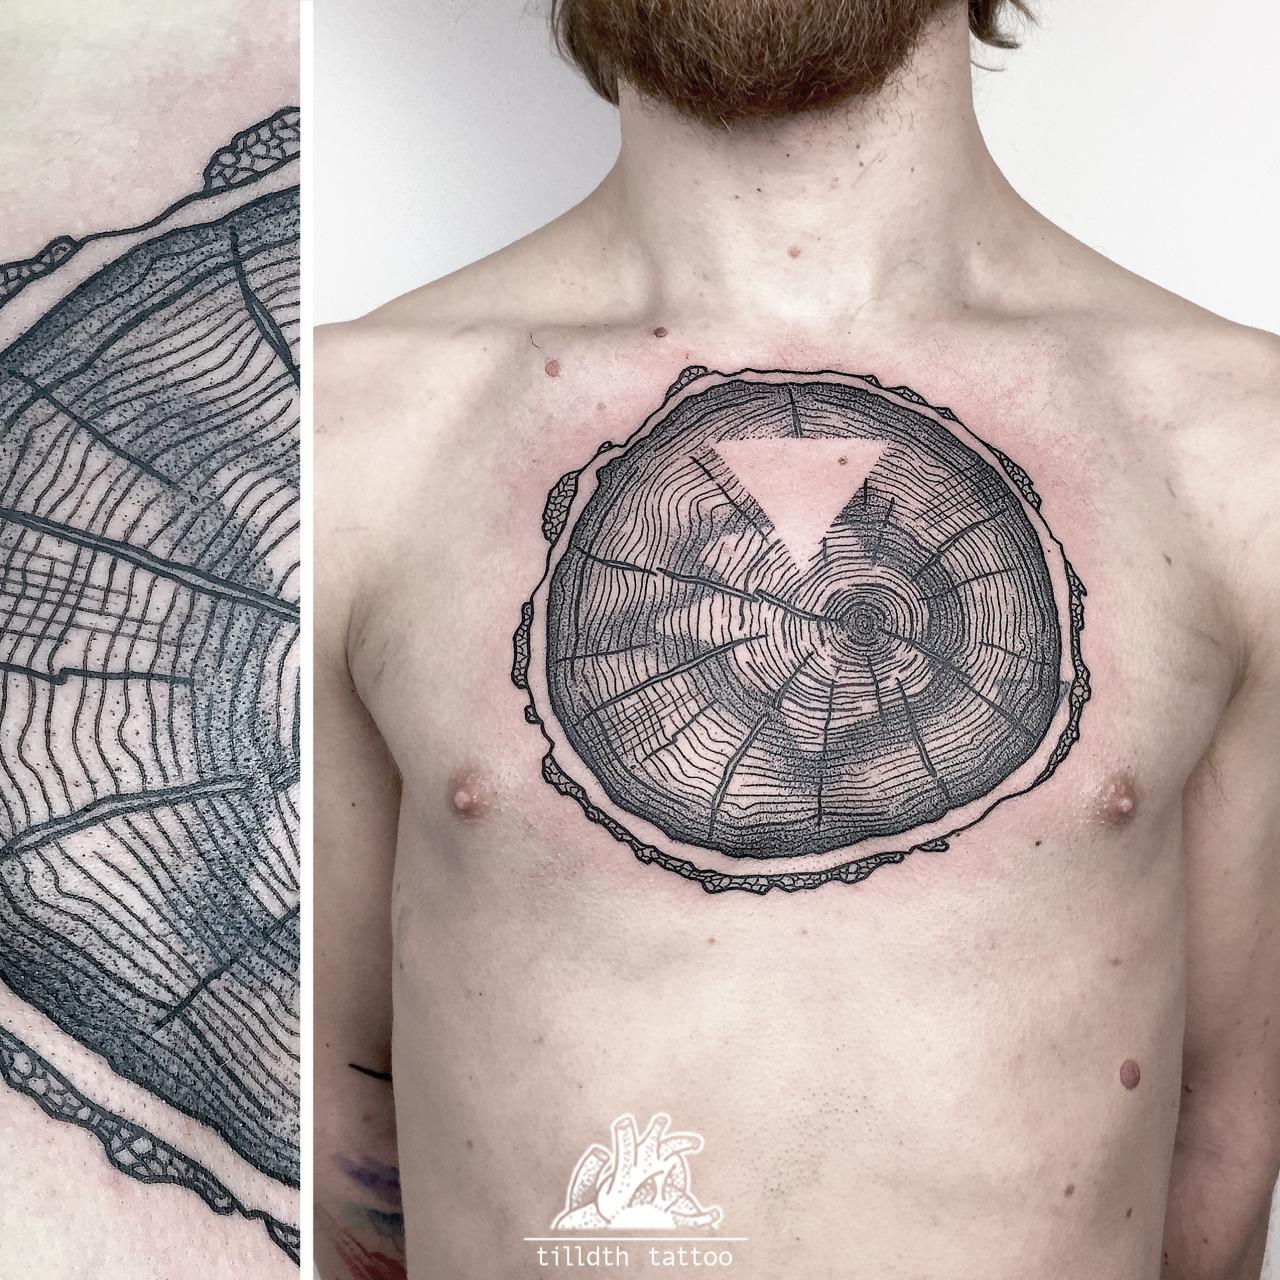 Tilldth Tattoo - the vandallist (13)